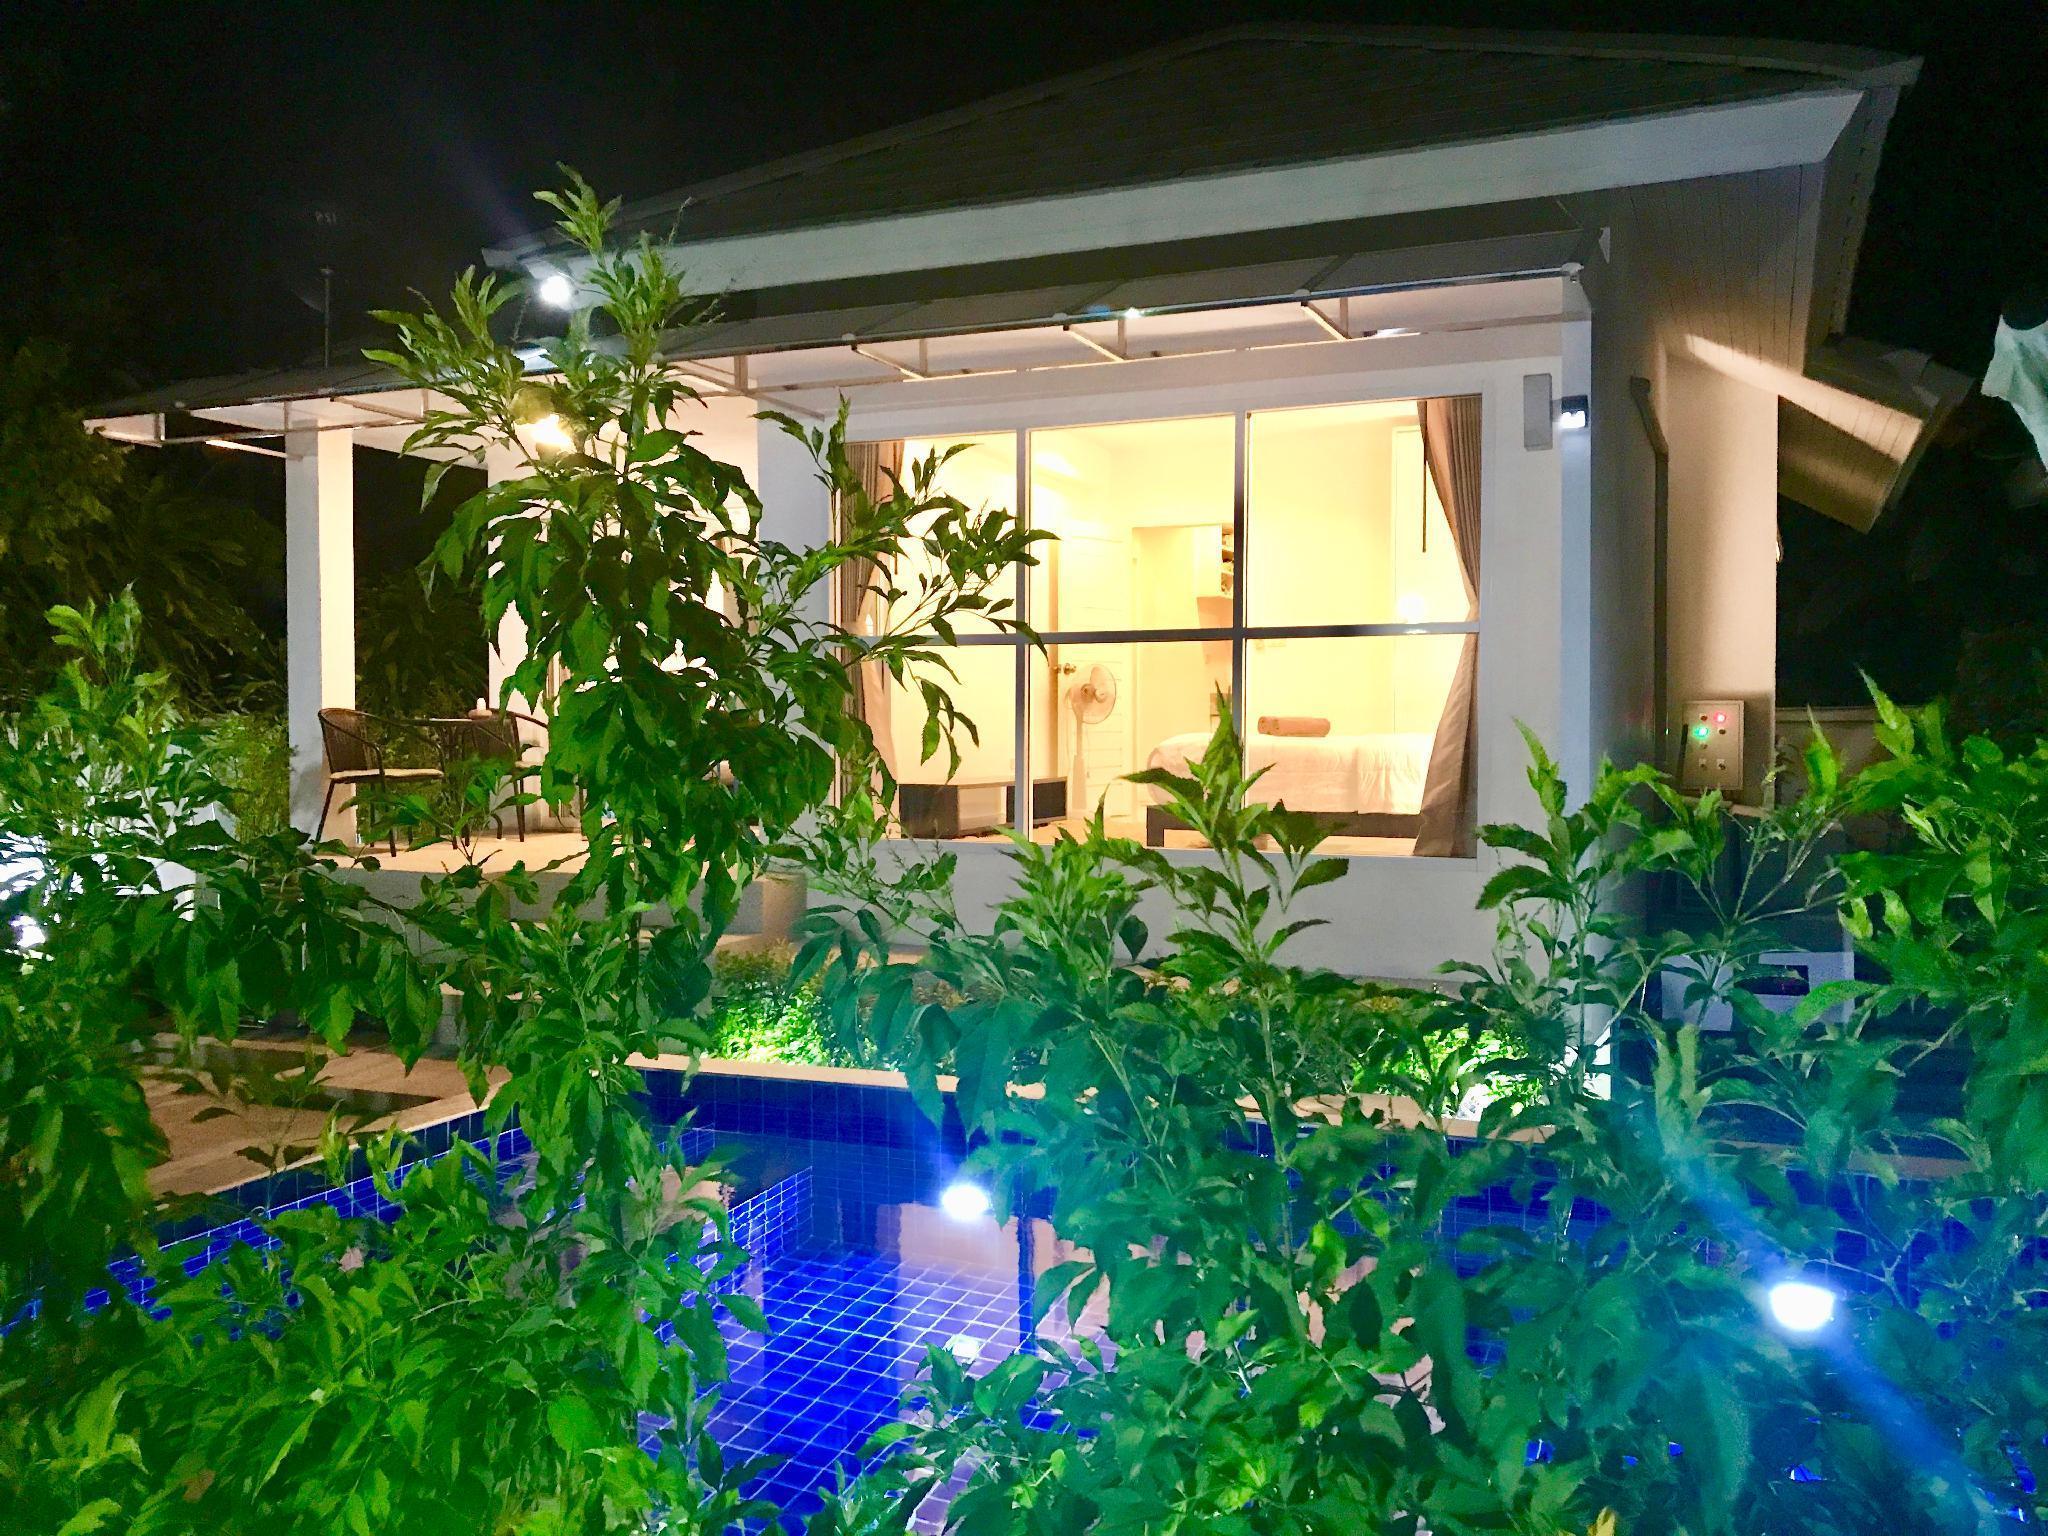 2 Bedroom Luxury Pool Villa Jasmine -walk to beach วิลลา 2 ห้องนอน 1 ห้องน้ำส่วนตัว ขนาด 130 ตร.ม. – บางปอ